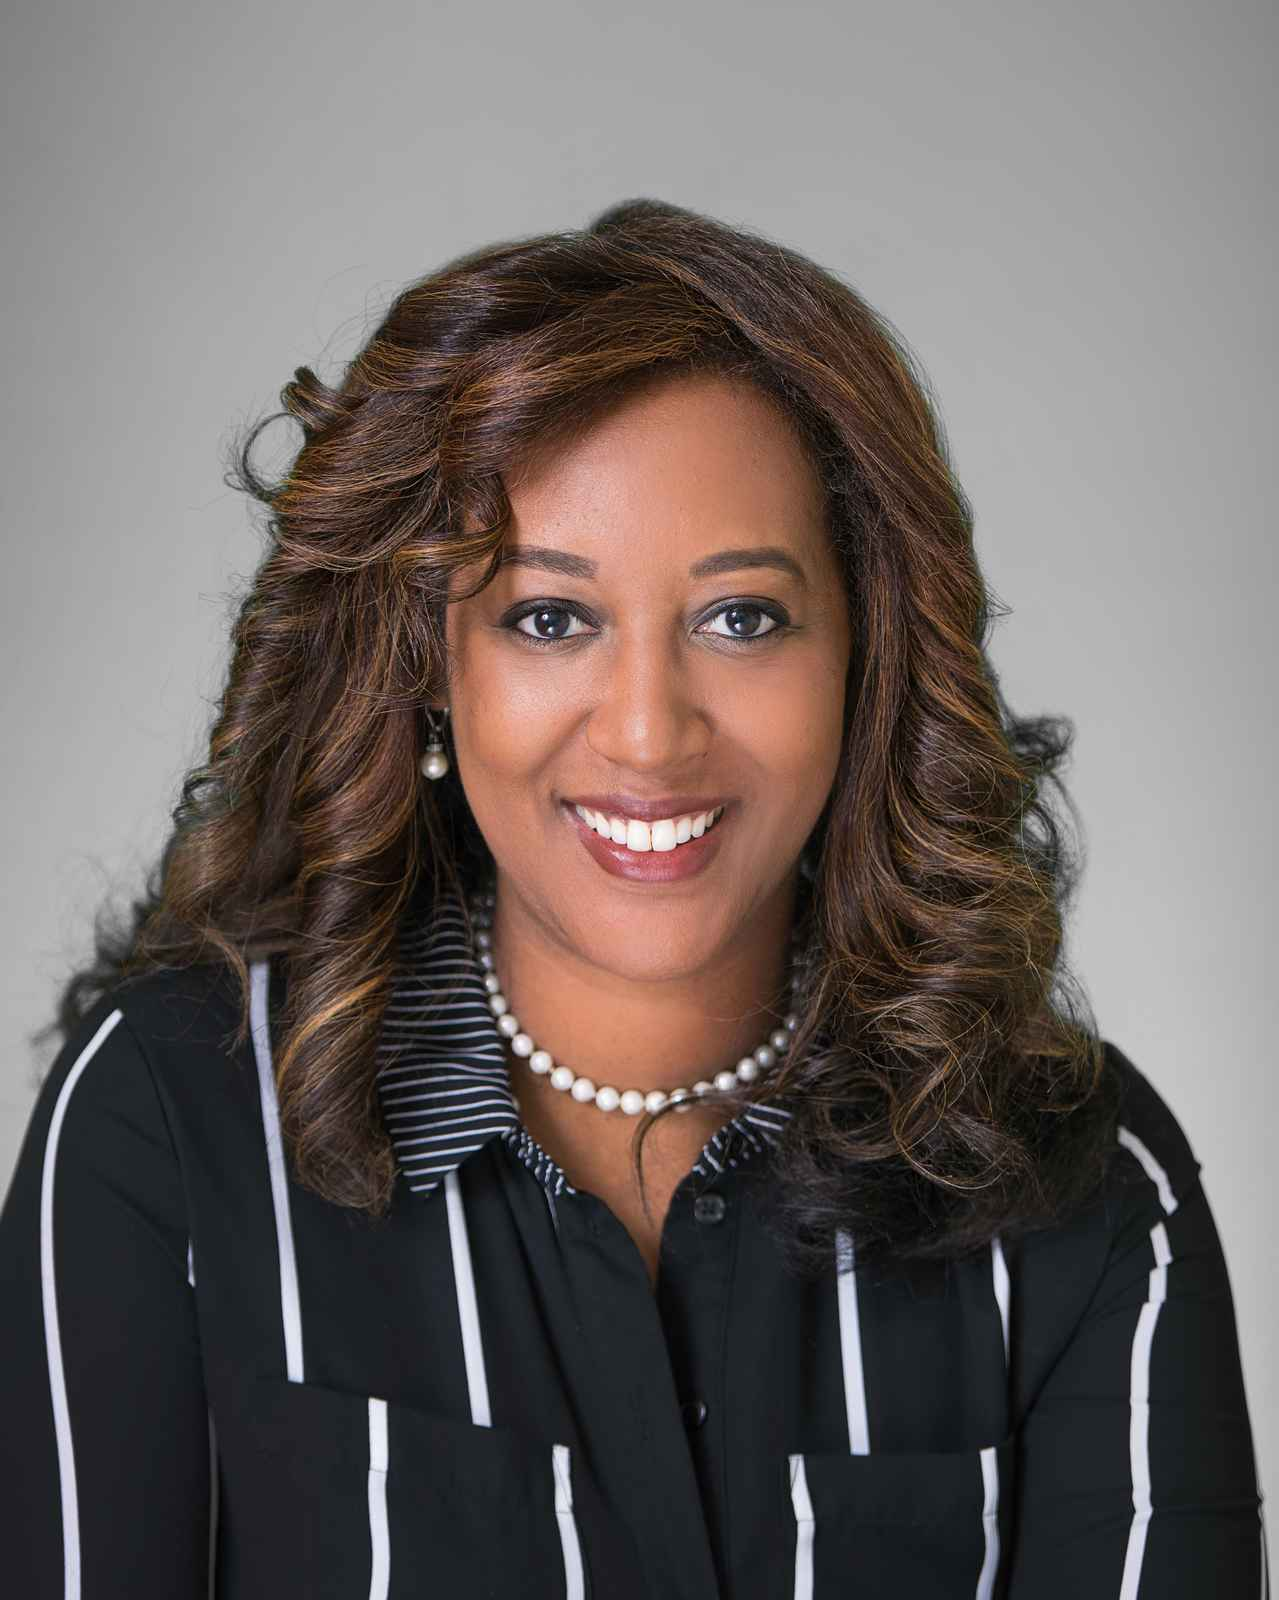 Alma Muriel Fotos menna demessie, ph.d. - congressional black caucus foundation